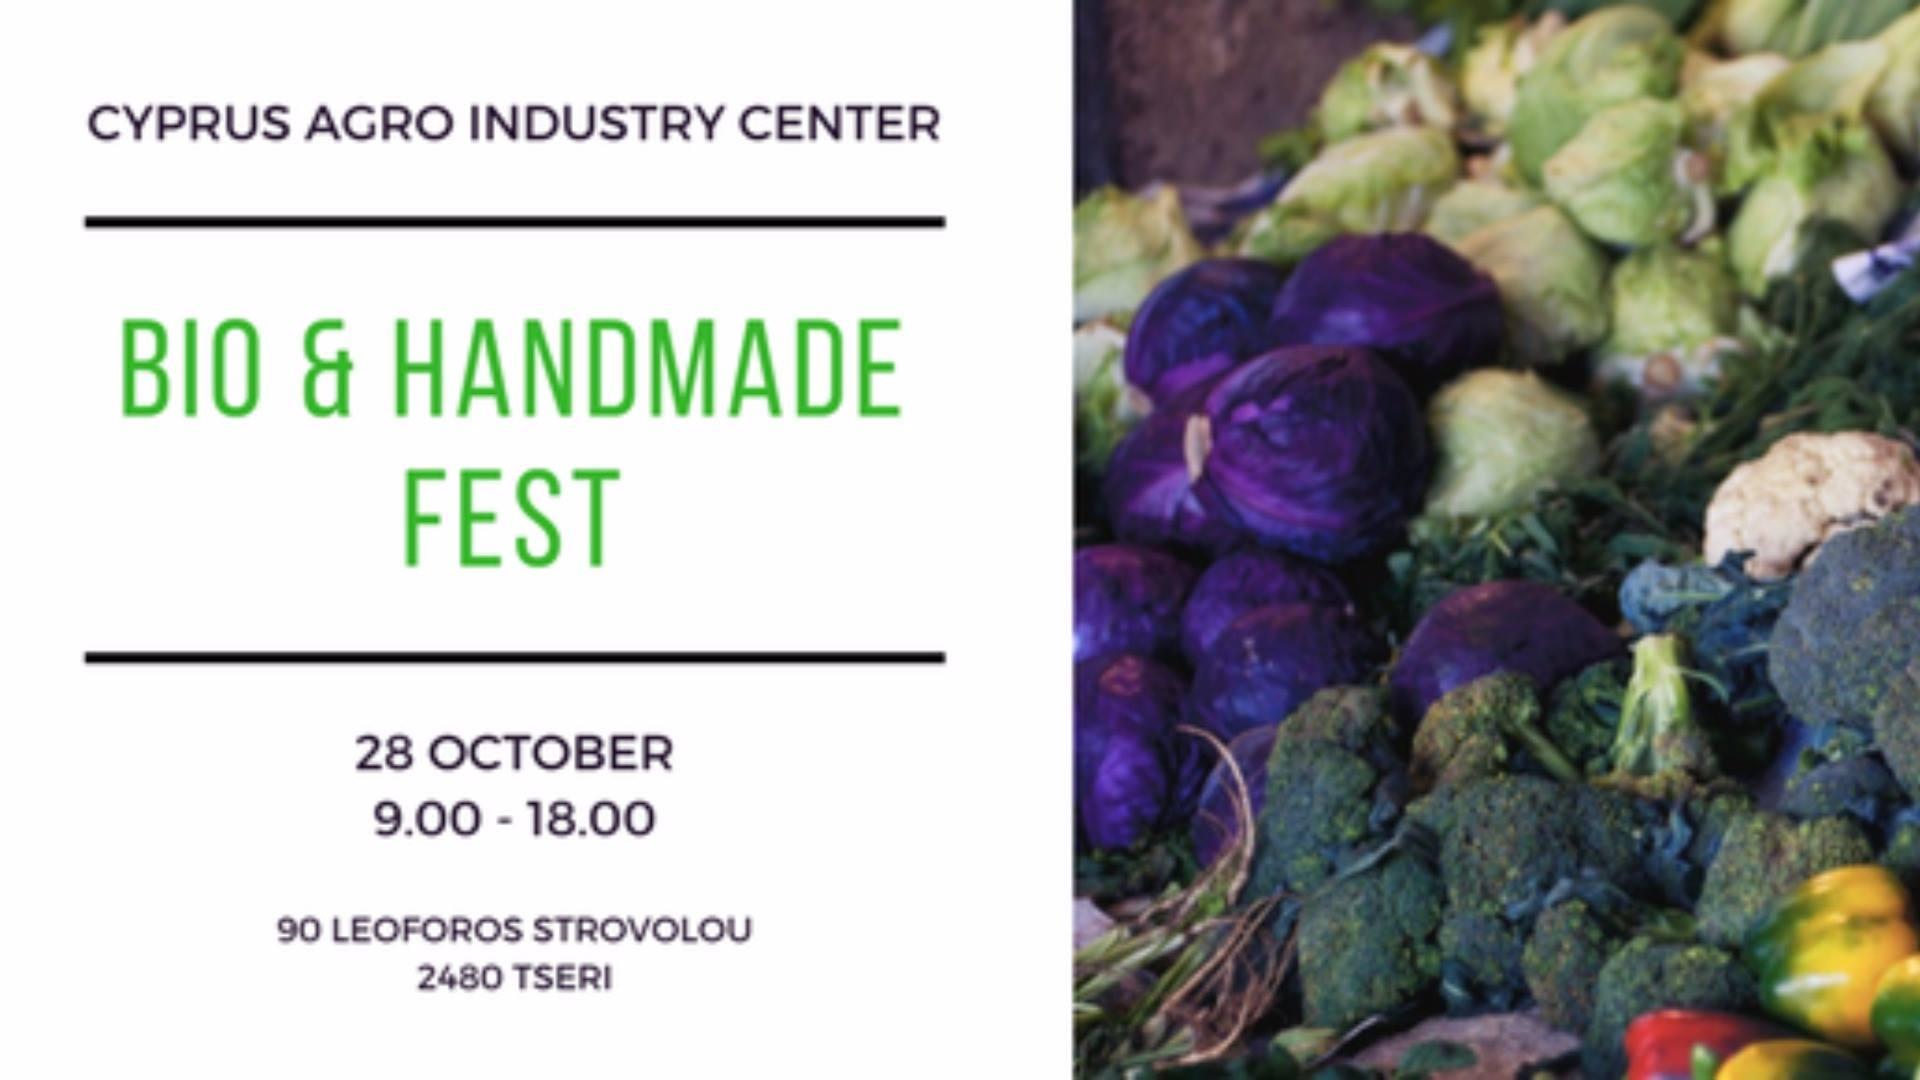 BIO & Handmade Fest